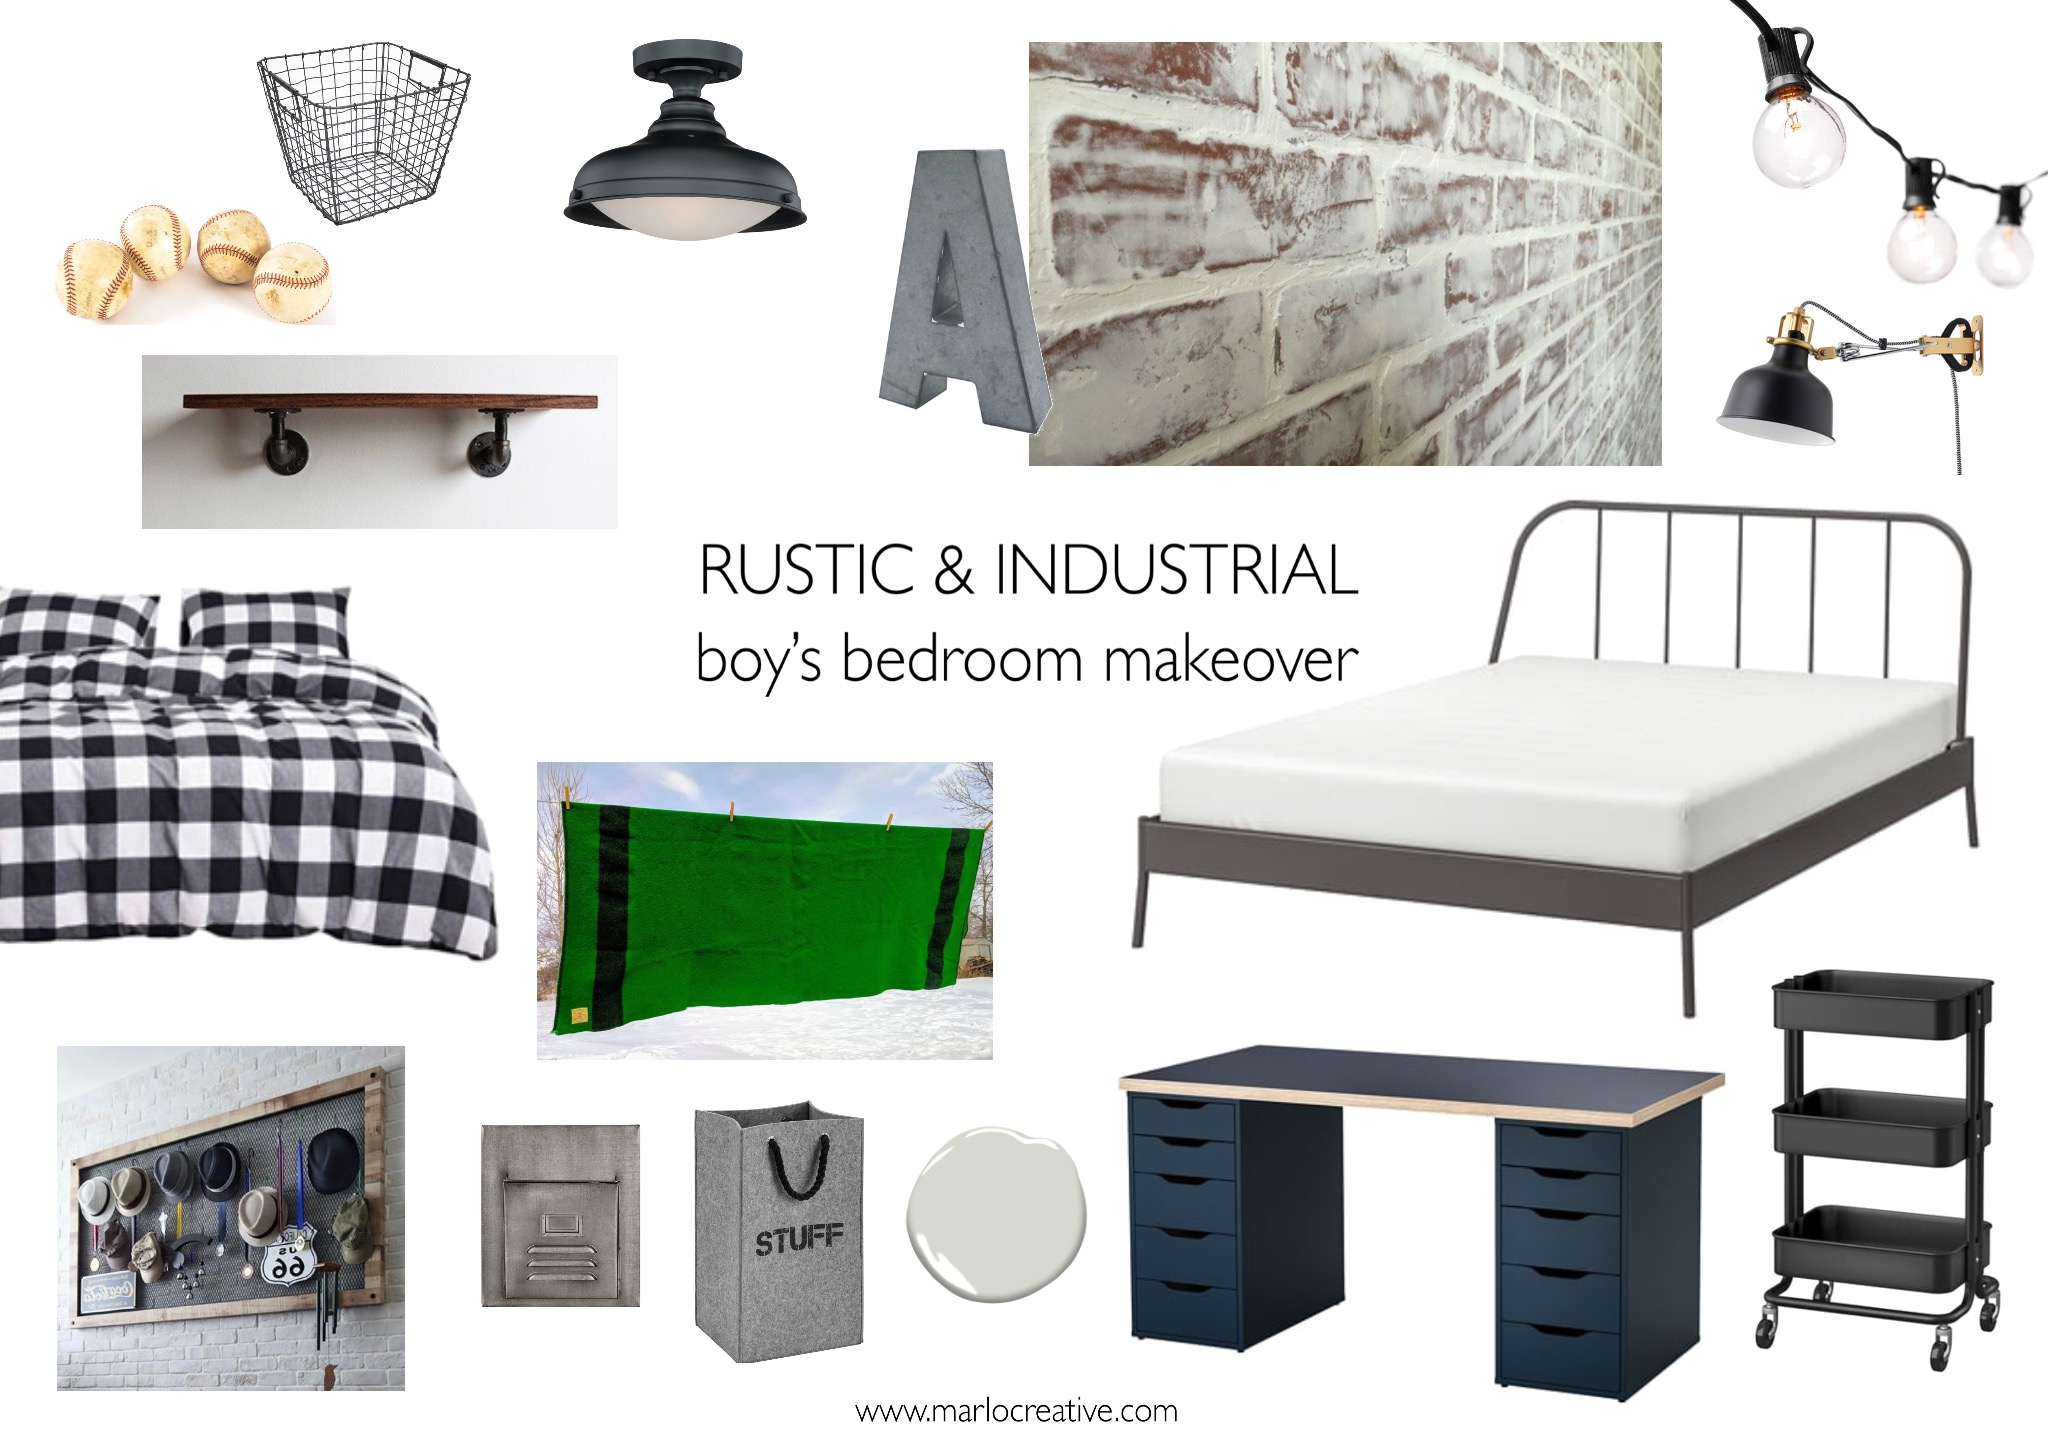 Calgary Interior Designer - Industrial Boys Bedroom Makeover